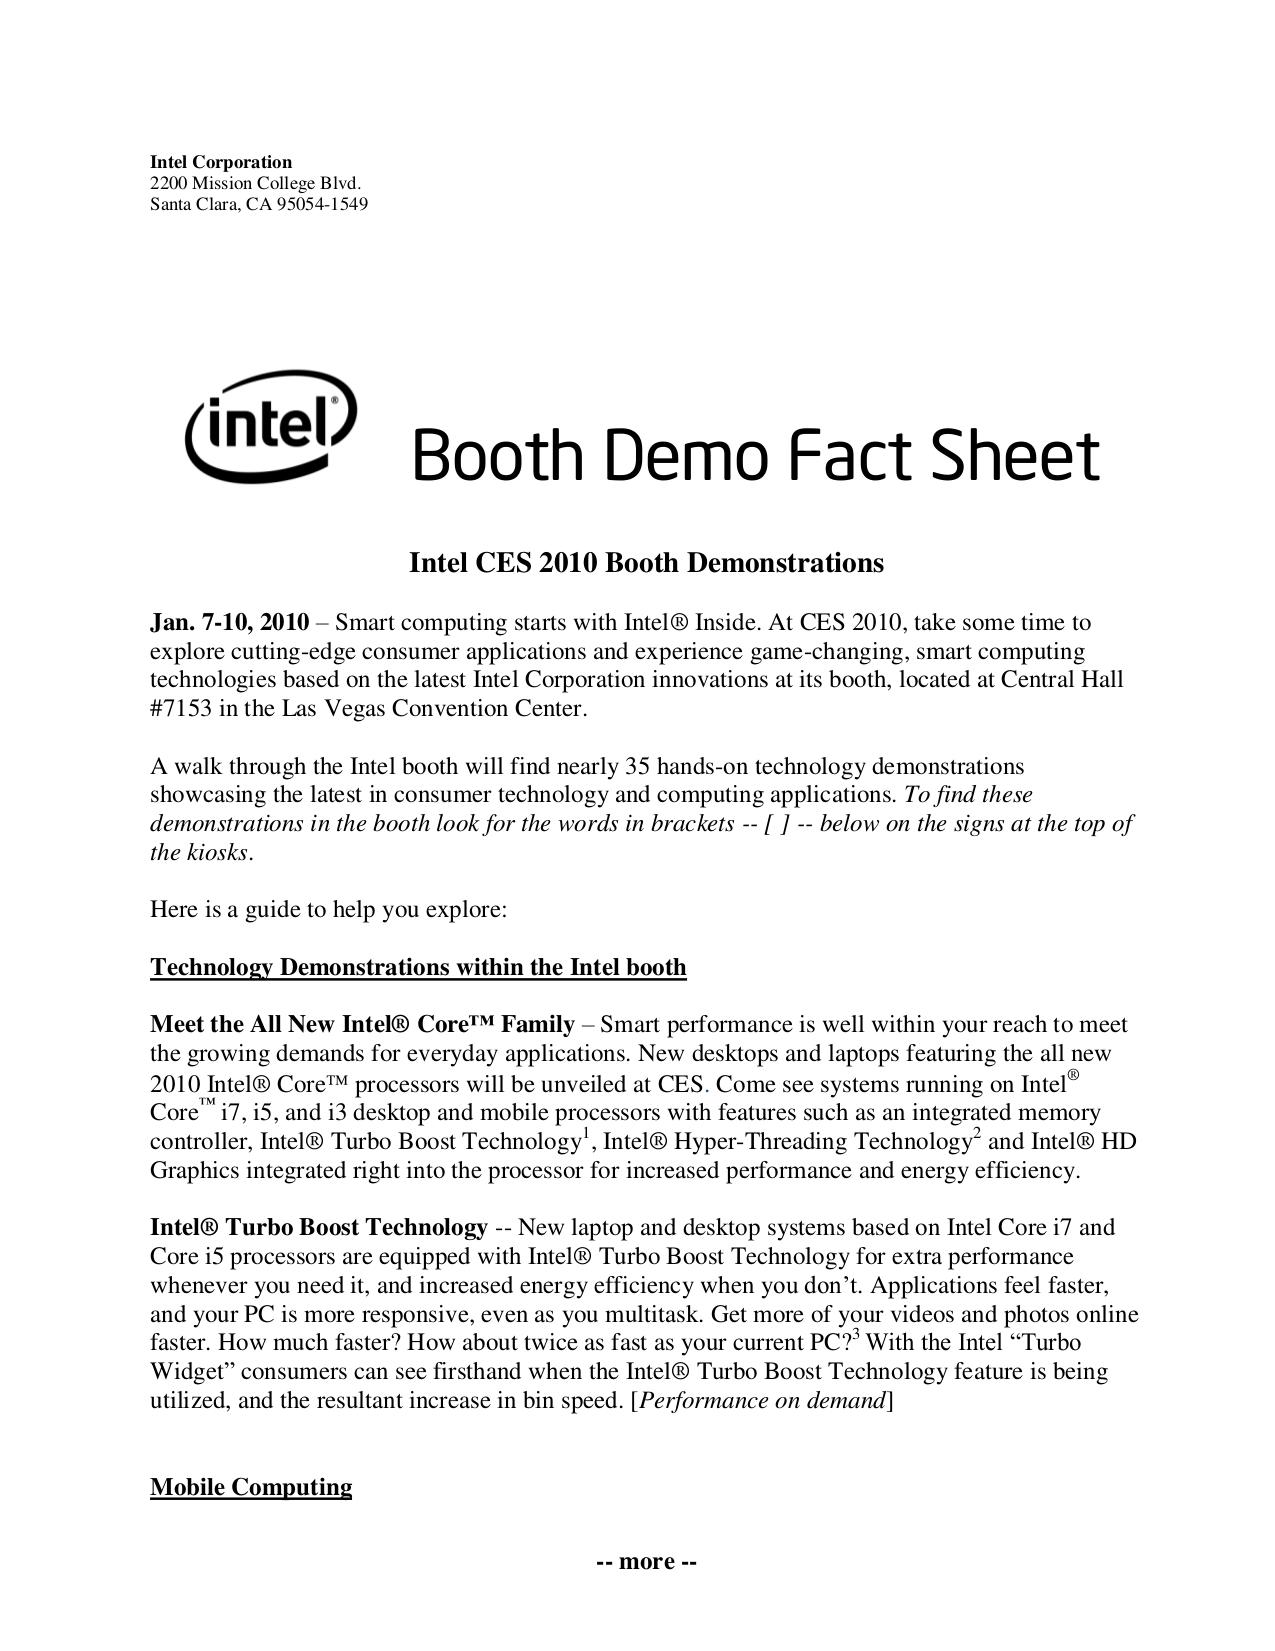 pdf for Viliv Laptop S5 manual